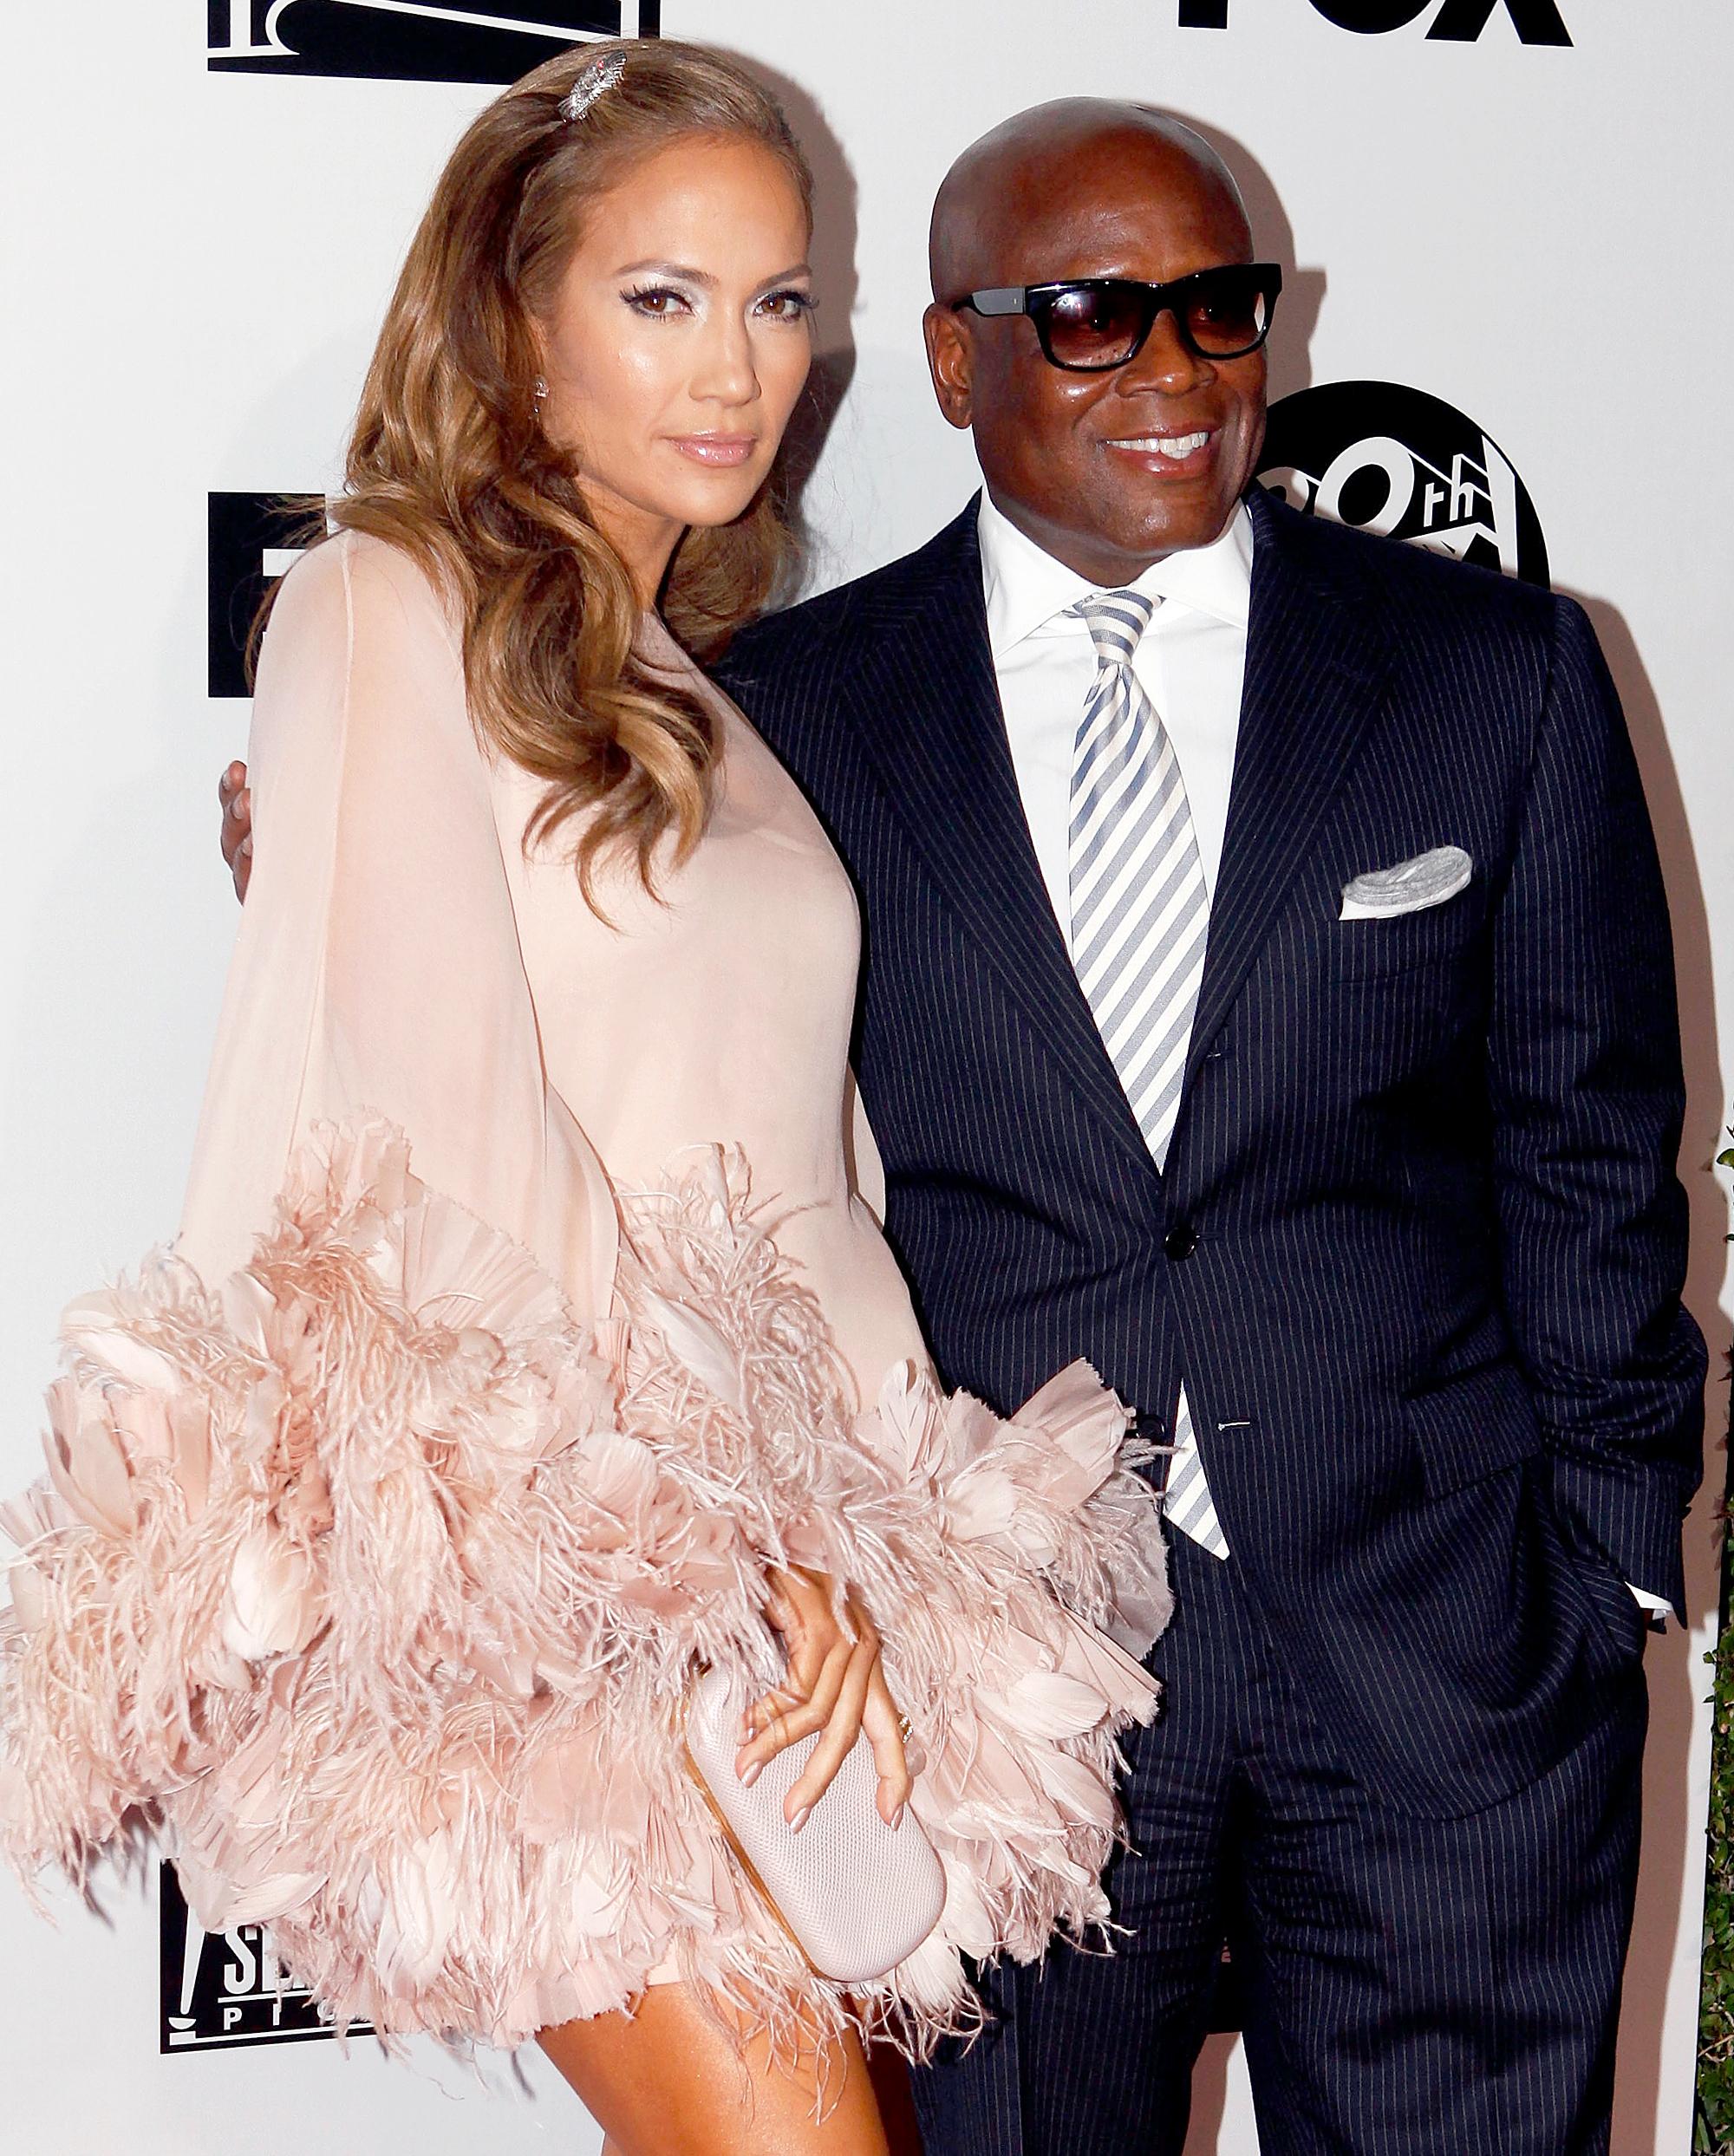 Jennifer Lopez and L.A. Reid